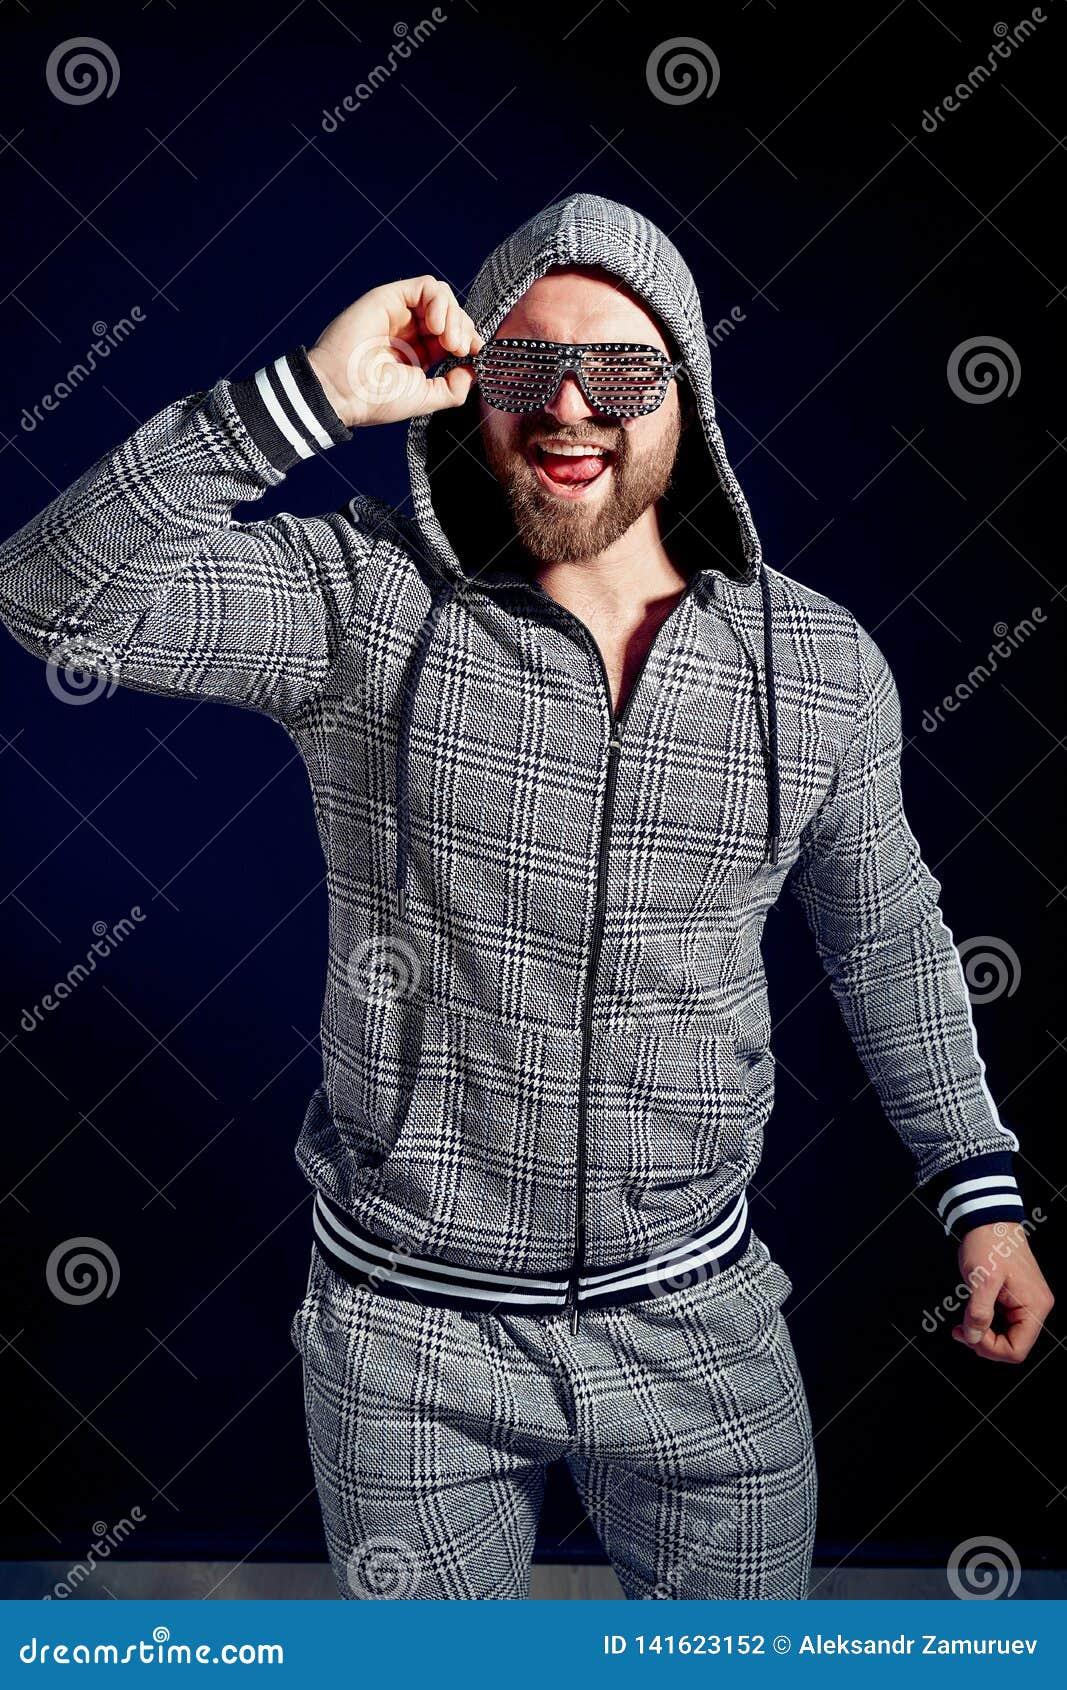 In mens in modieus sportkostuum en zonnebril